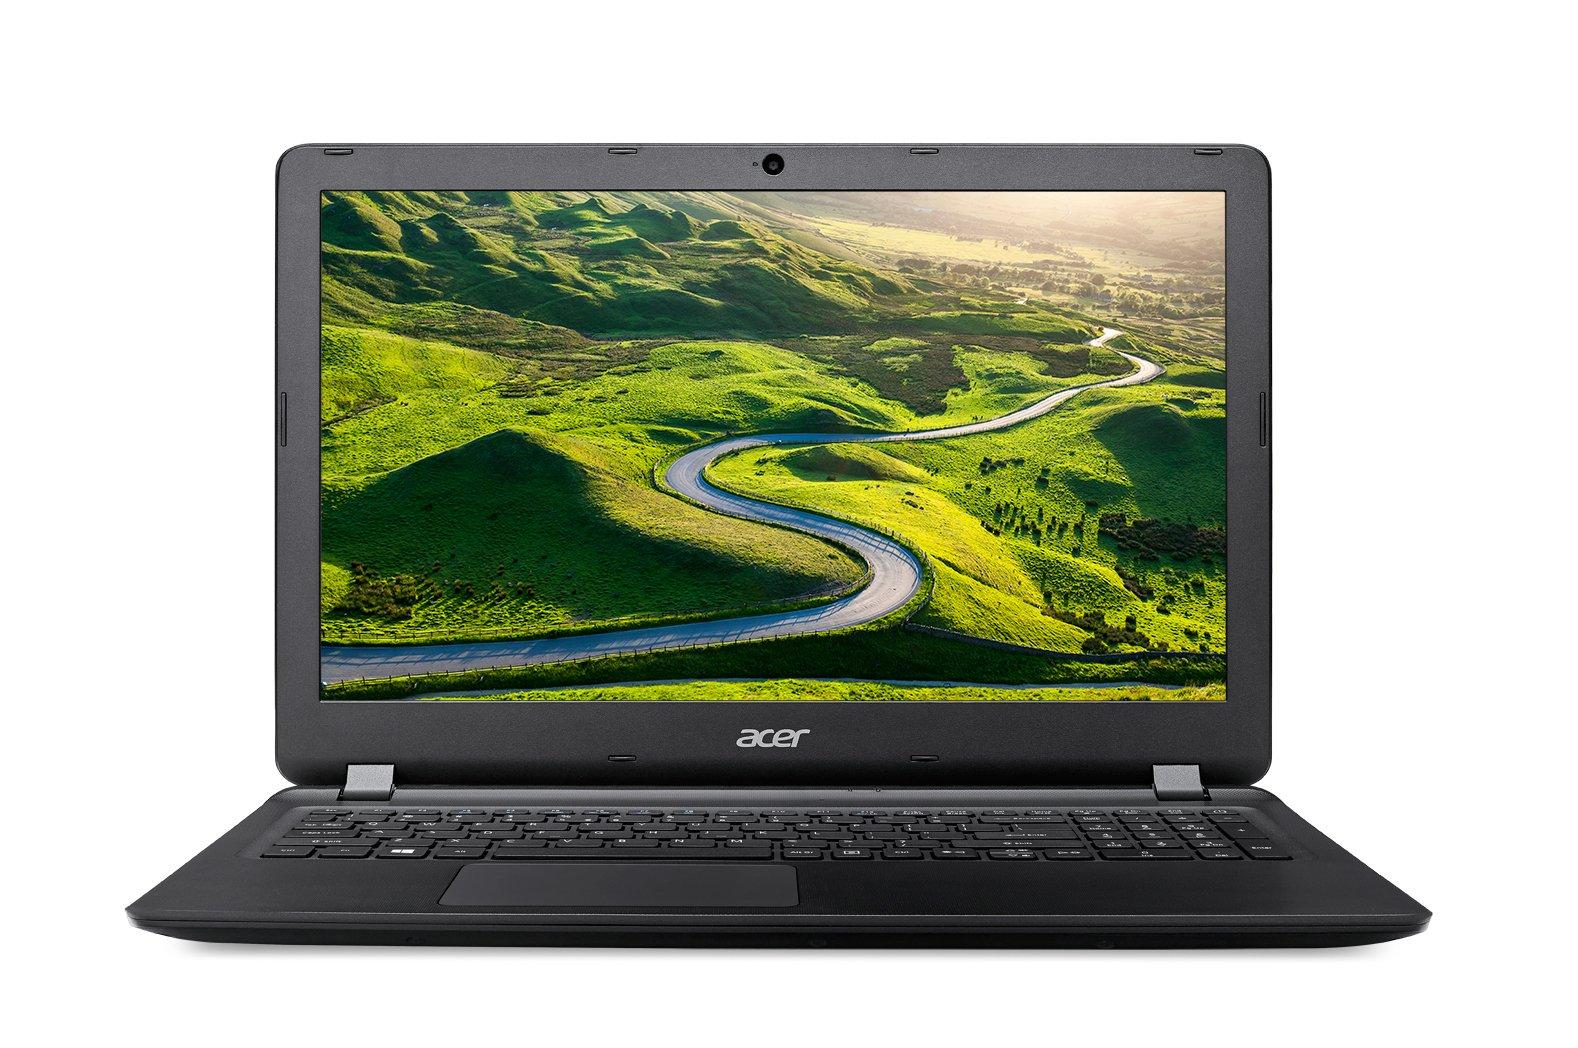 "Acer Aspire ES 15 (ES1-533-C95R) Celeron N3350/4GB+N/A/128GB SSD+N/DVDRW/HD Graphics/15.6""FHD LED matný/Boot-up Linux/Bl"